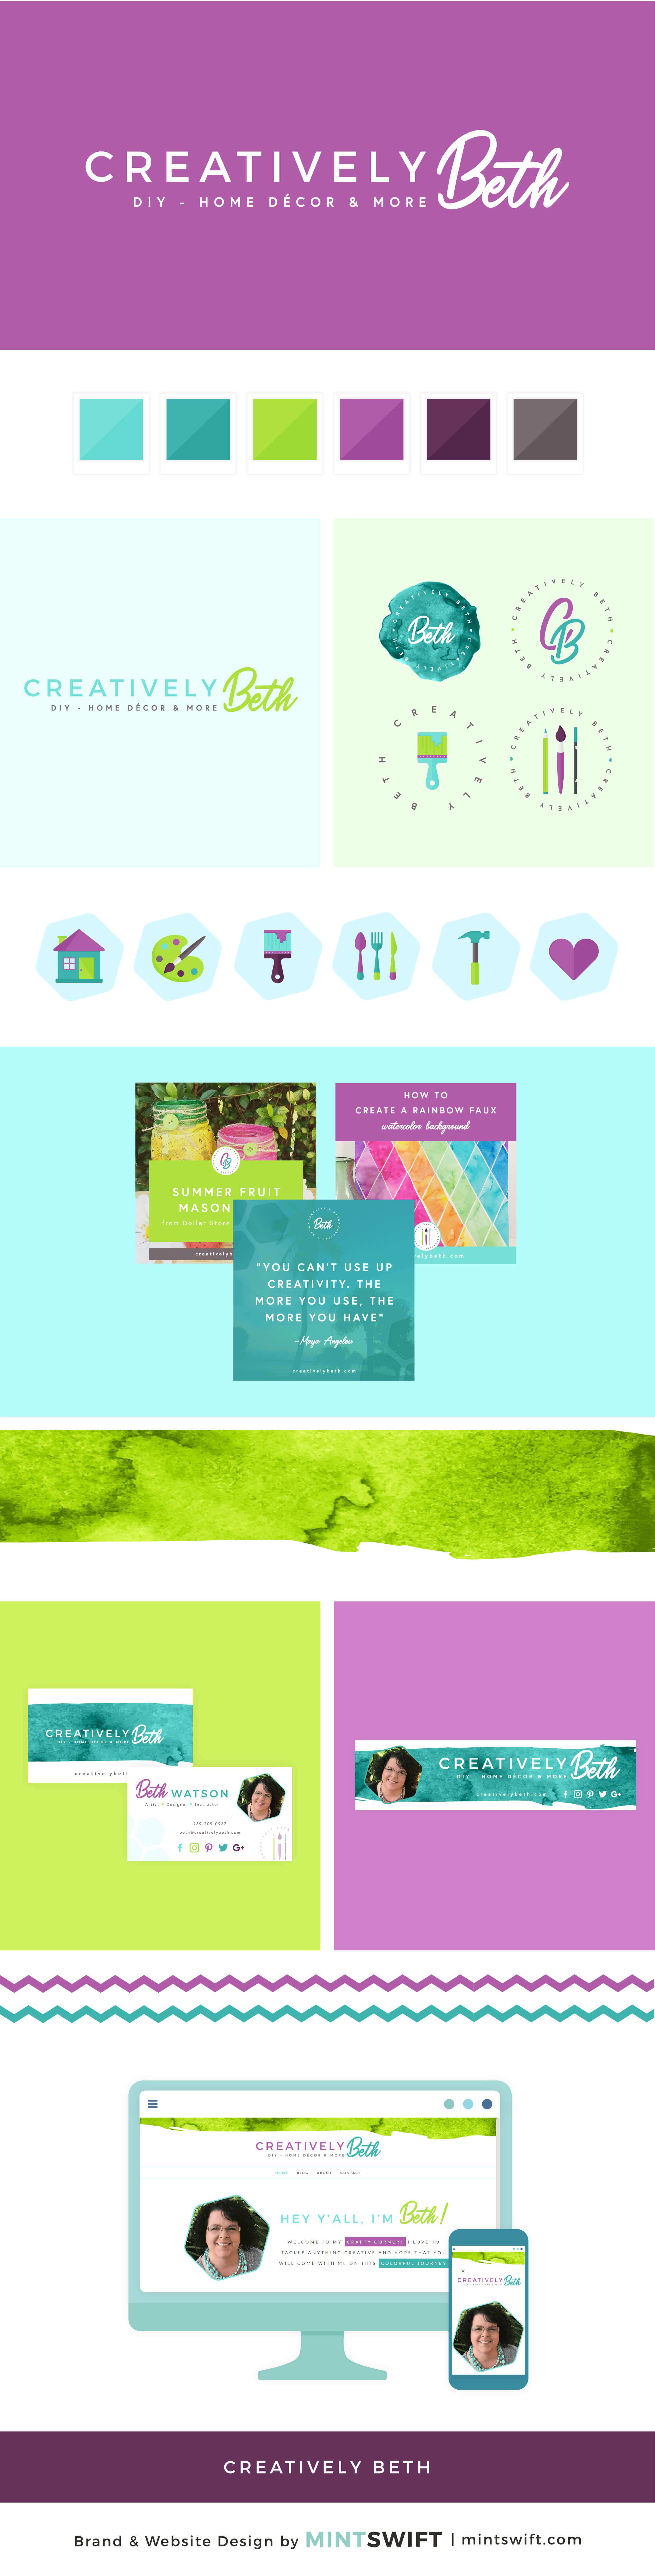 Creatively Beth - Brand & Website Design Package - MintSwift